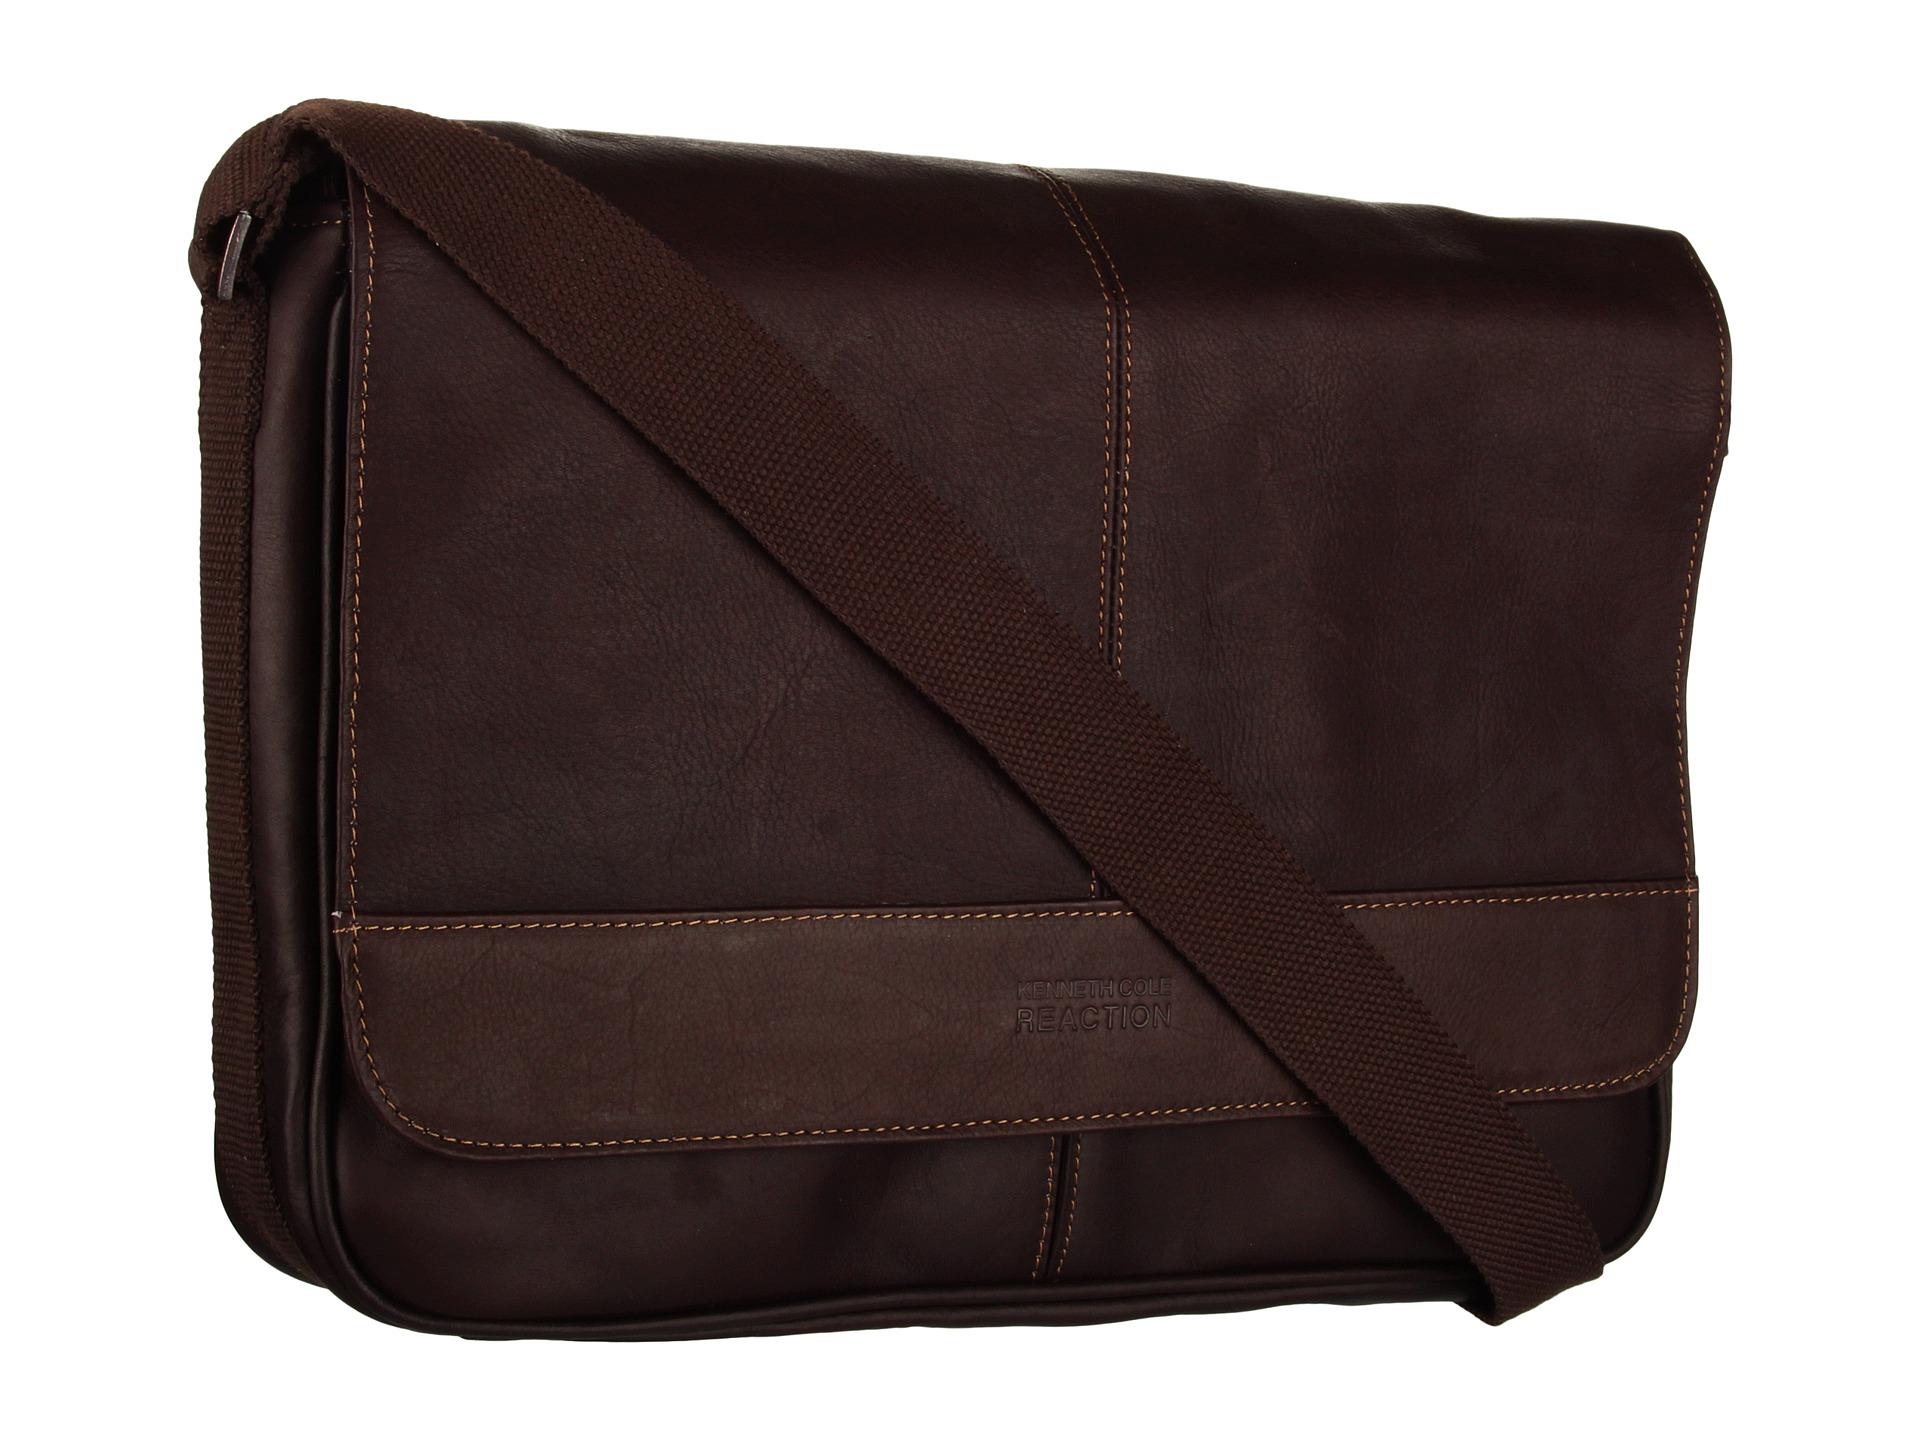 Kenneth Cole Reaction  Risky Business  Single Gusset Messenger Bag Dark  Brown 30ca03197aec7